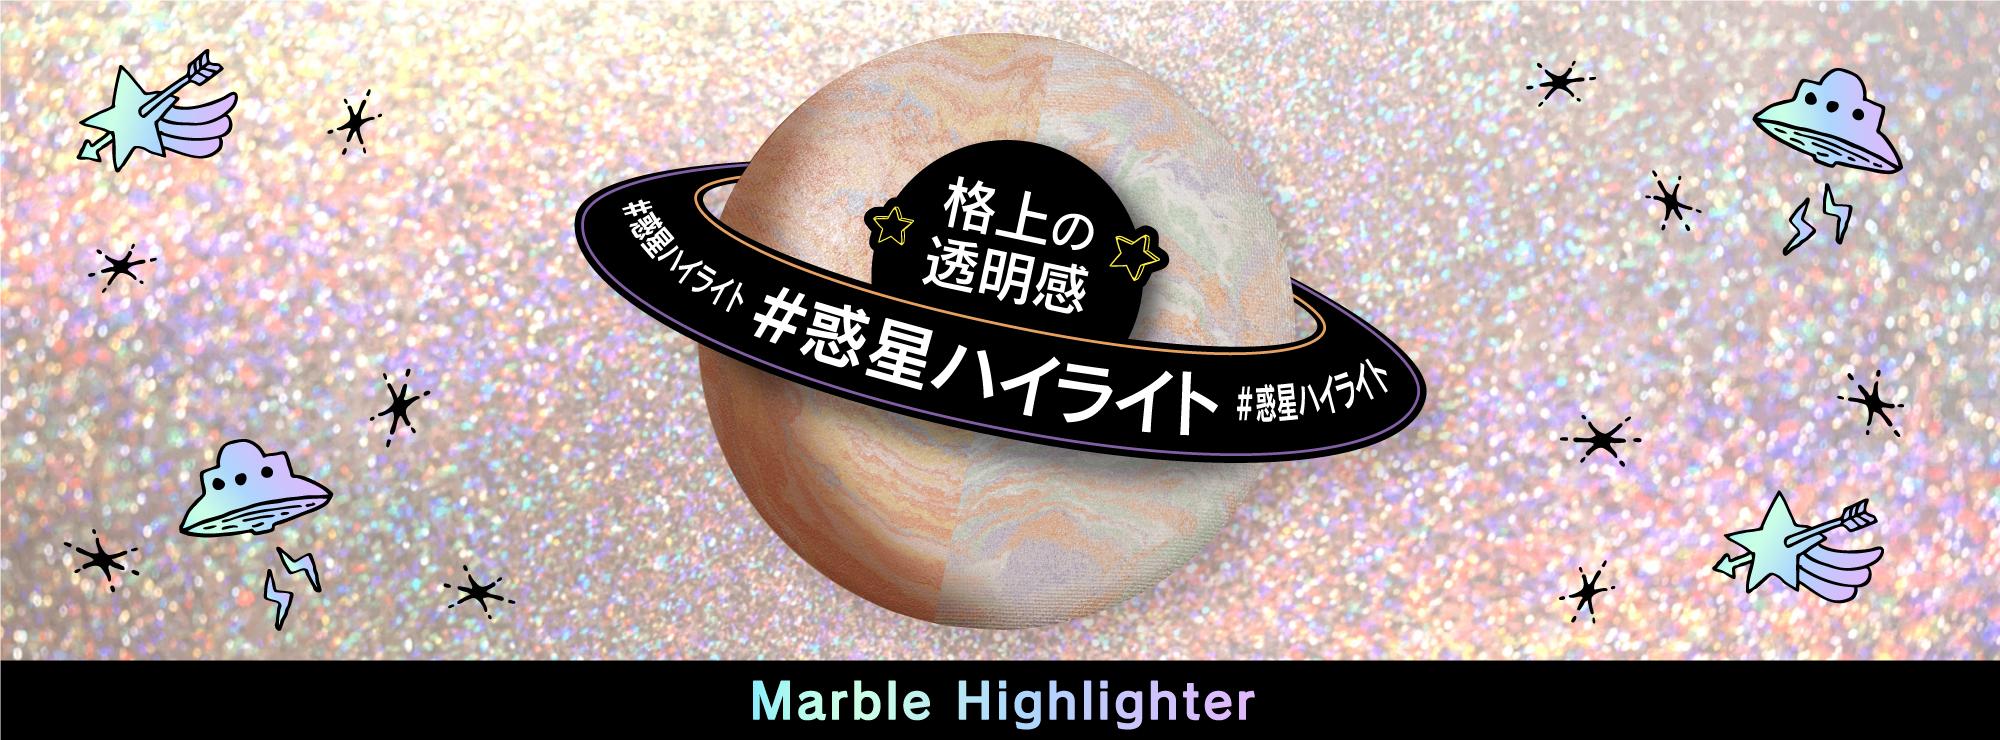 /images/slider/2000x740_MarbleHilighter_PC.jpg